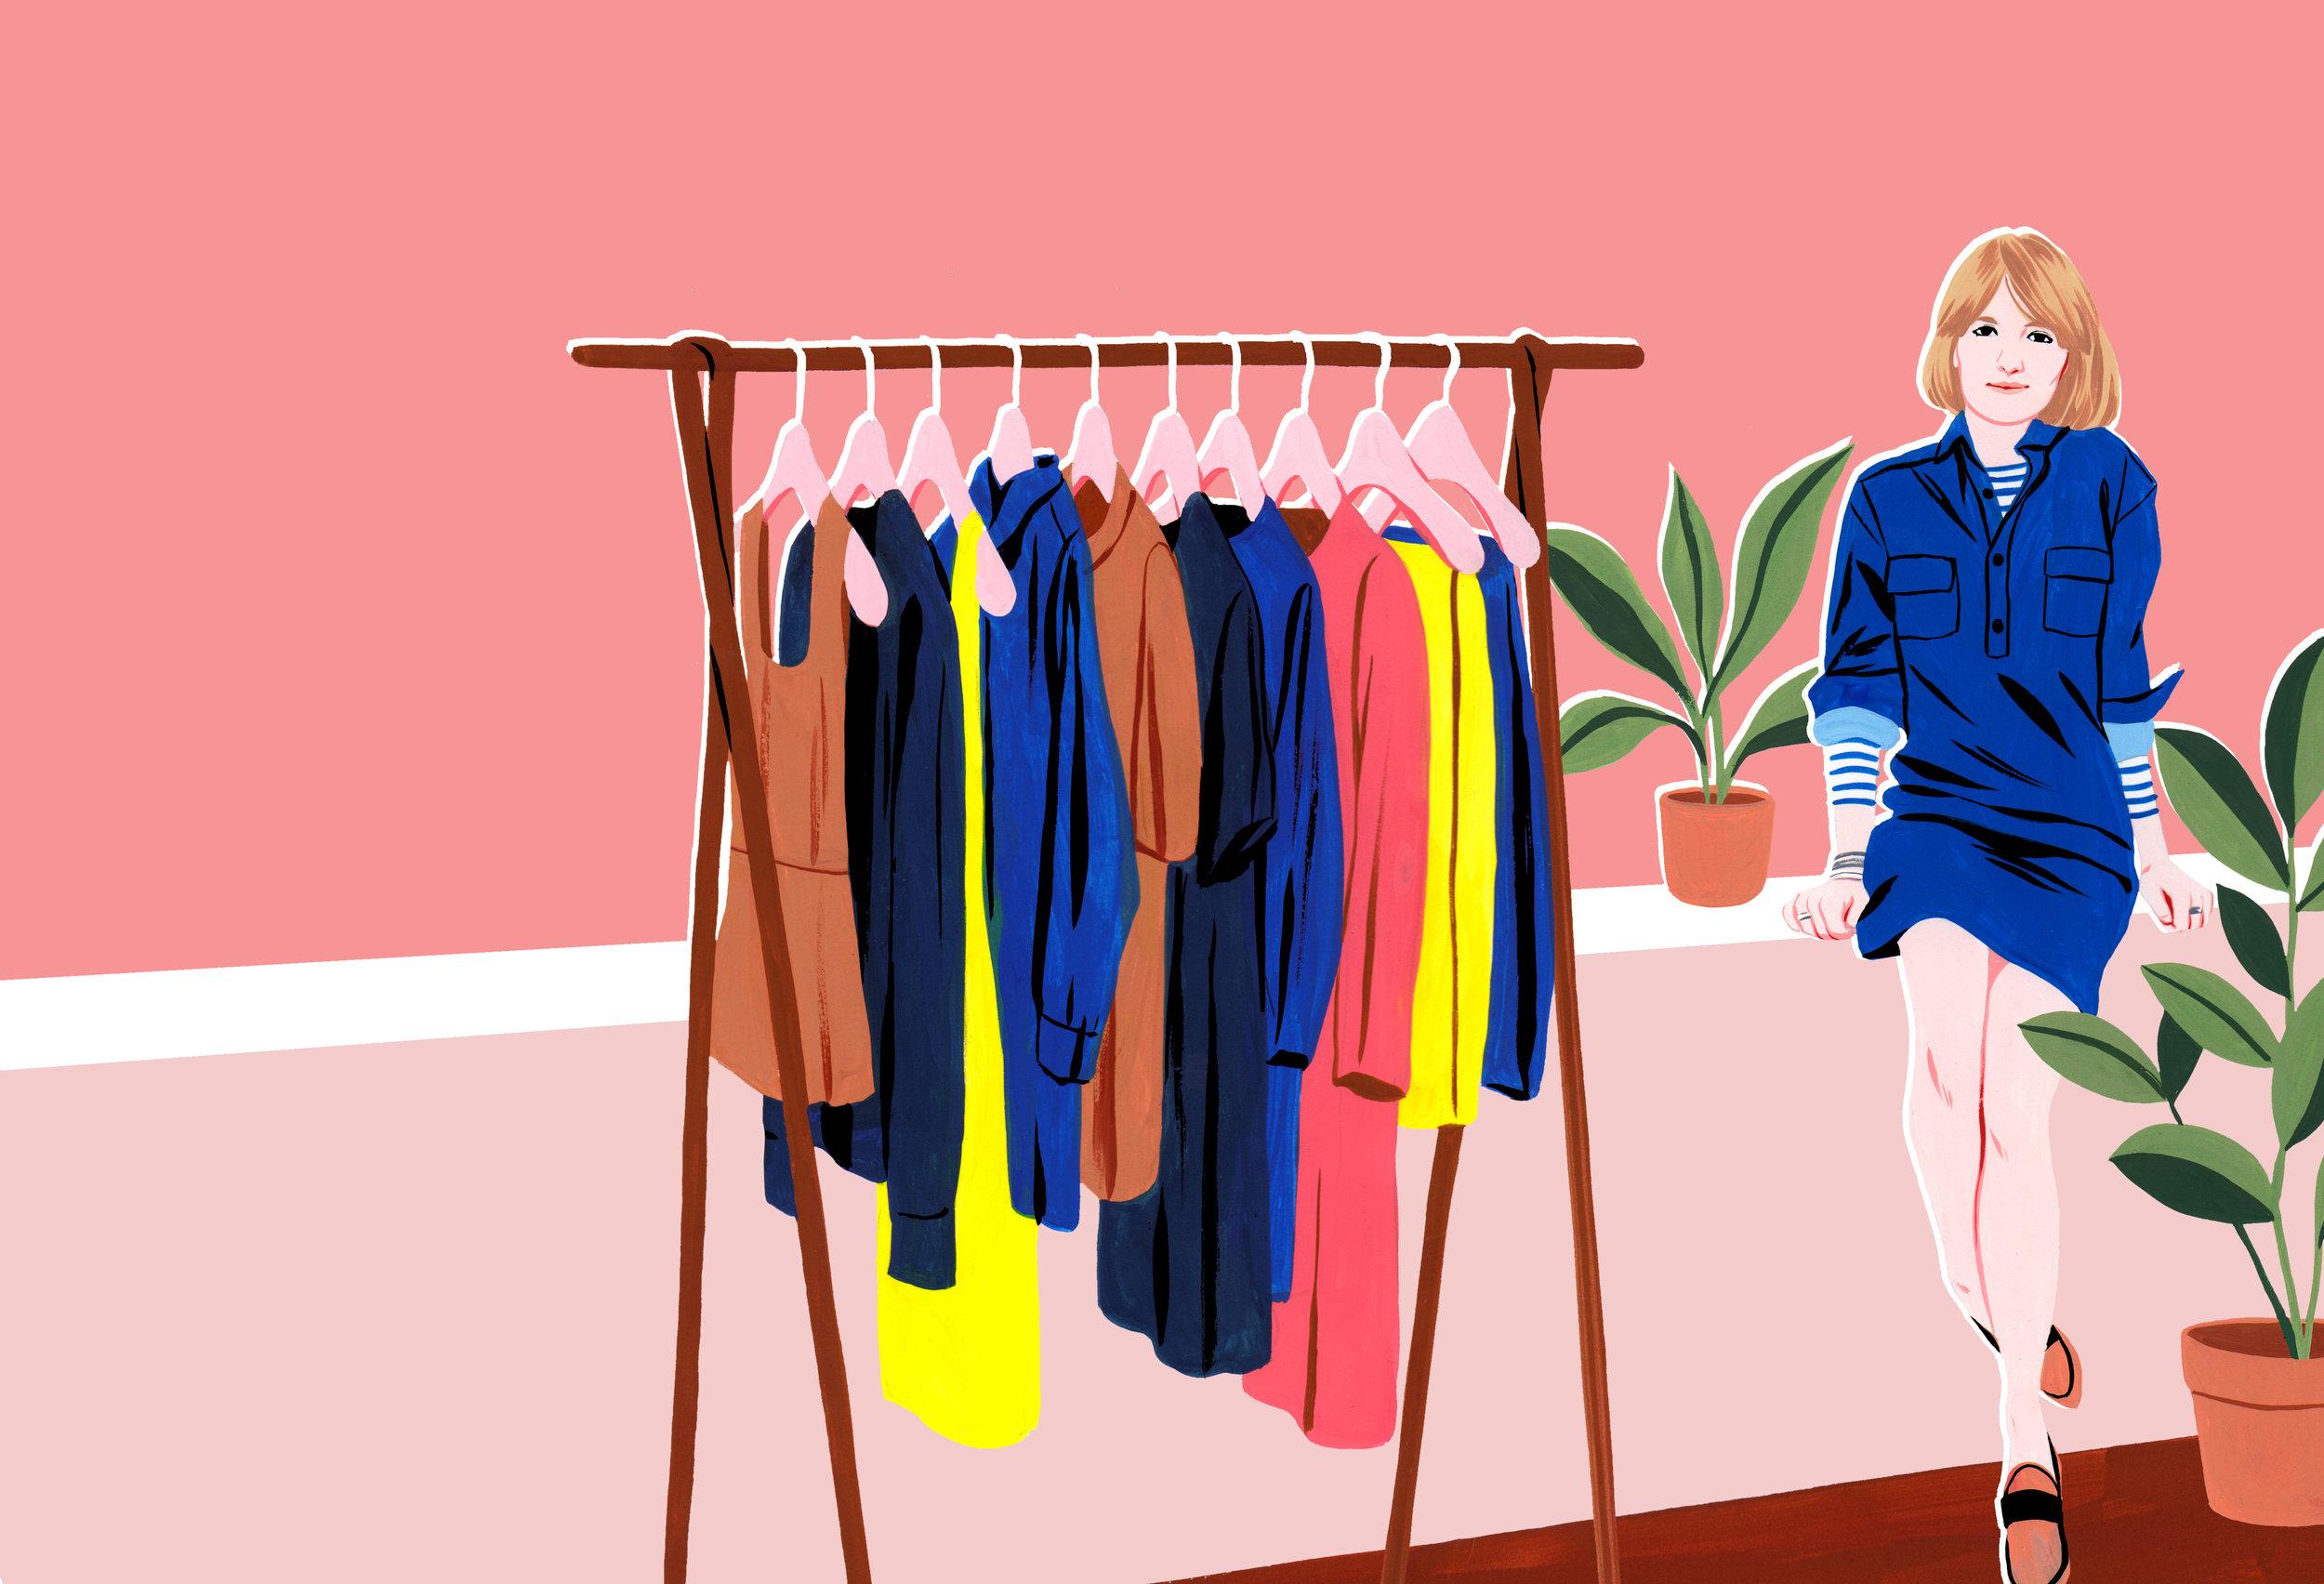 Illustration by Bijou Karman for Alexandra's book, How to Dress